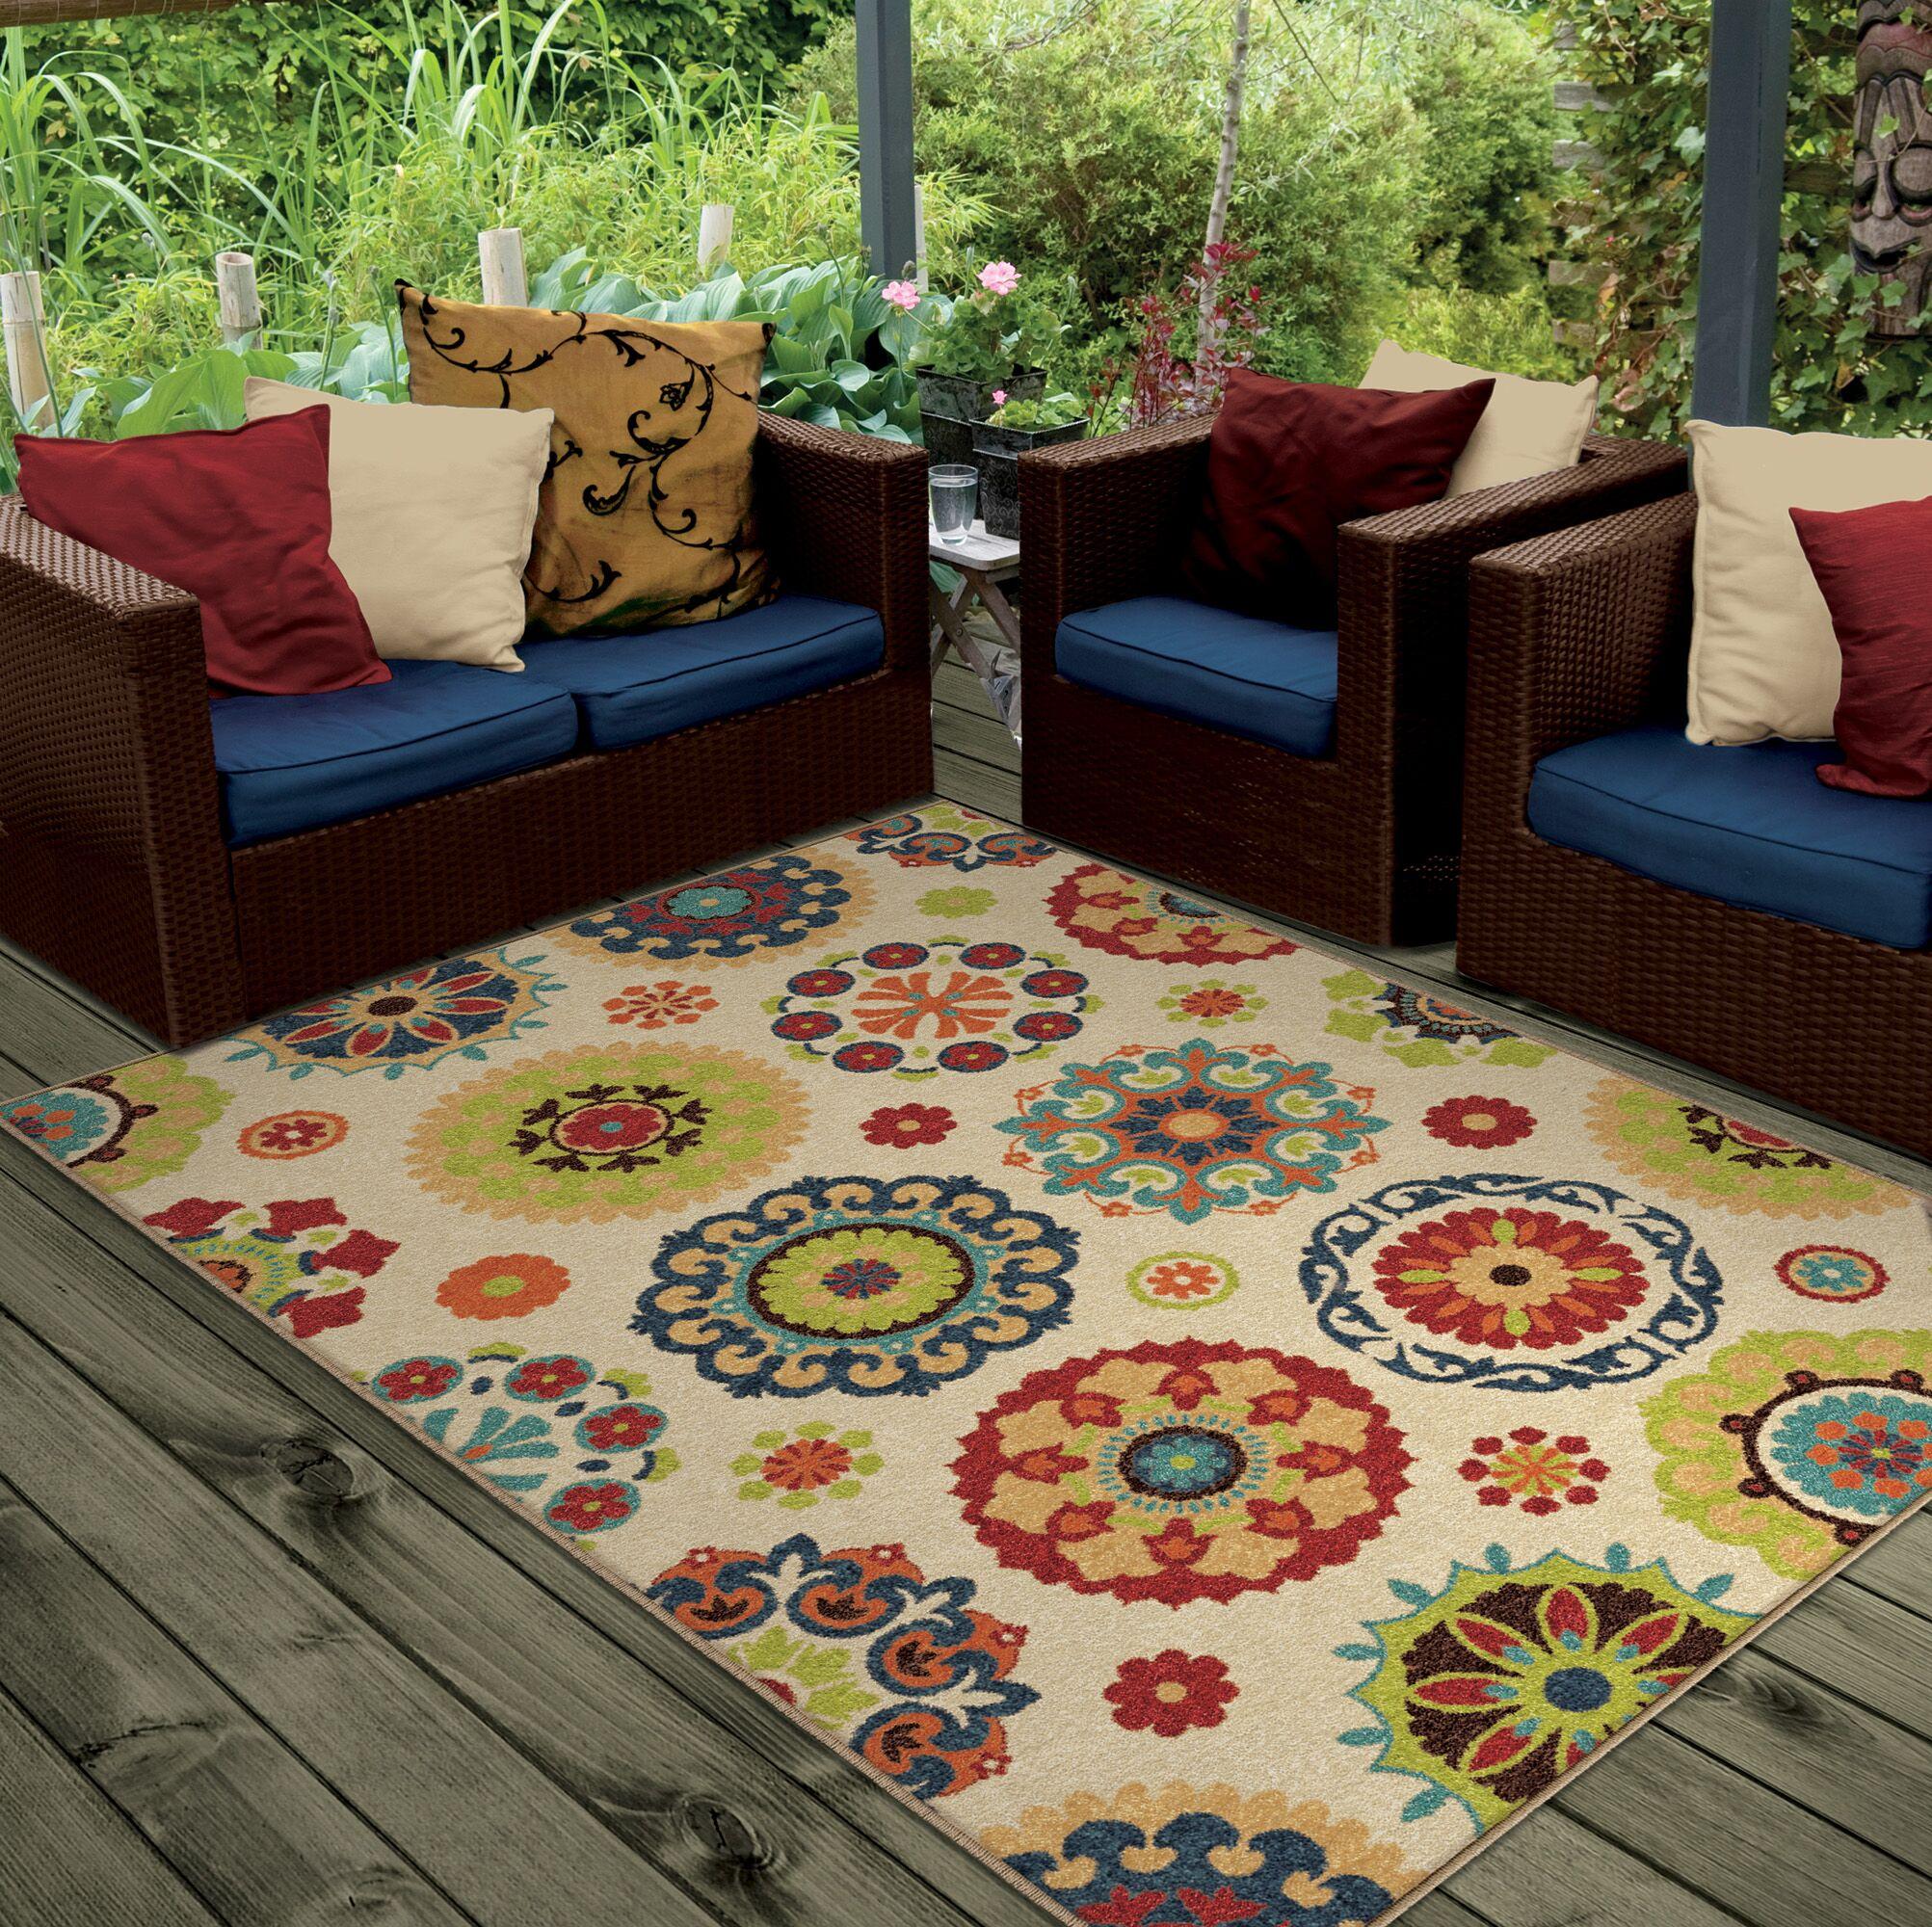 Maen Neutral Cream Indoor/Outdoor Area Rug Rug Size: Rectangle 7'8